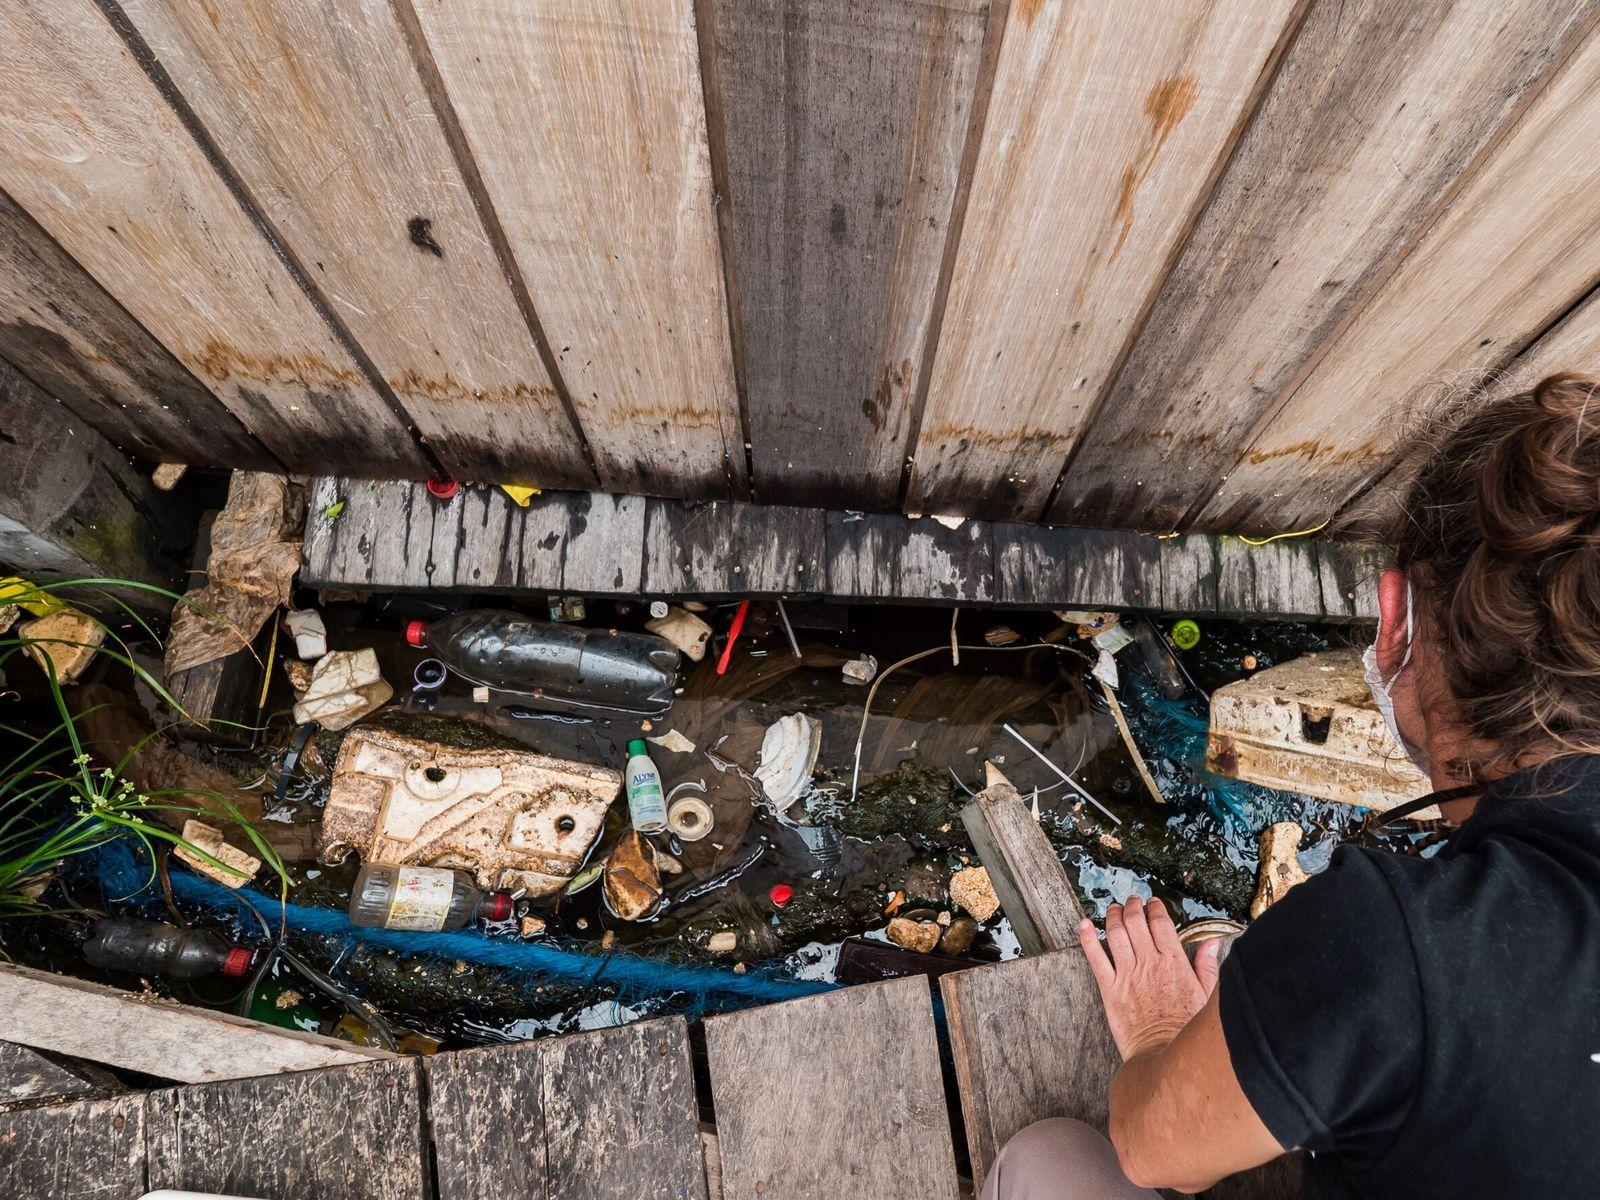 Resíduos se acumulam embaixo dos flutuantes ao longo do rio Negro, nas proximidades de Manaus. Mas ...